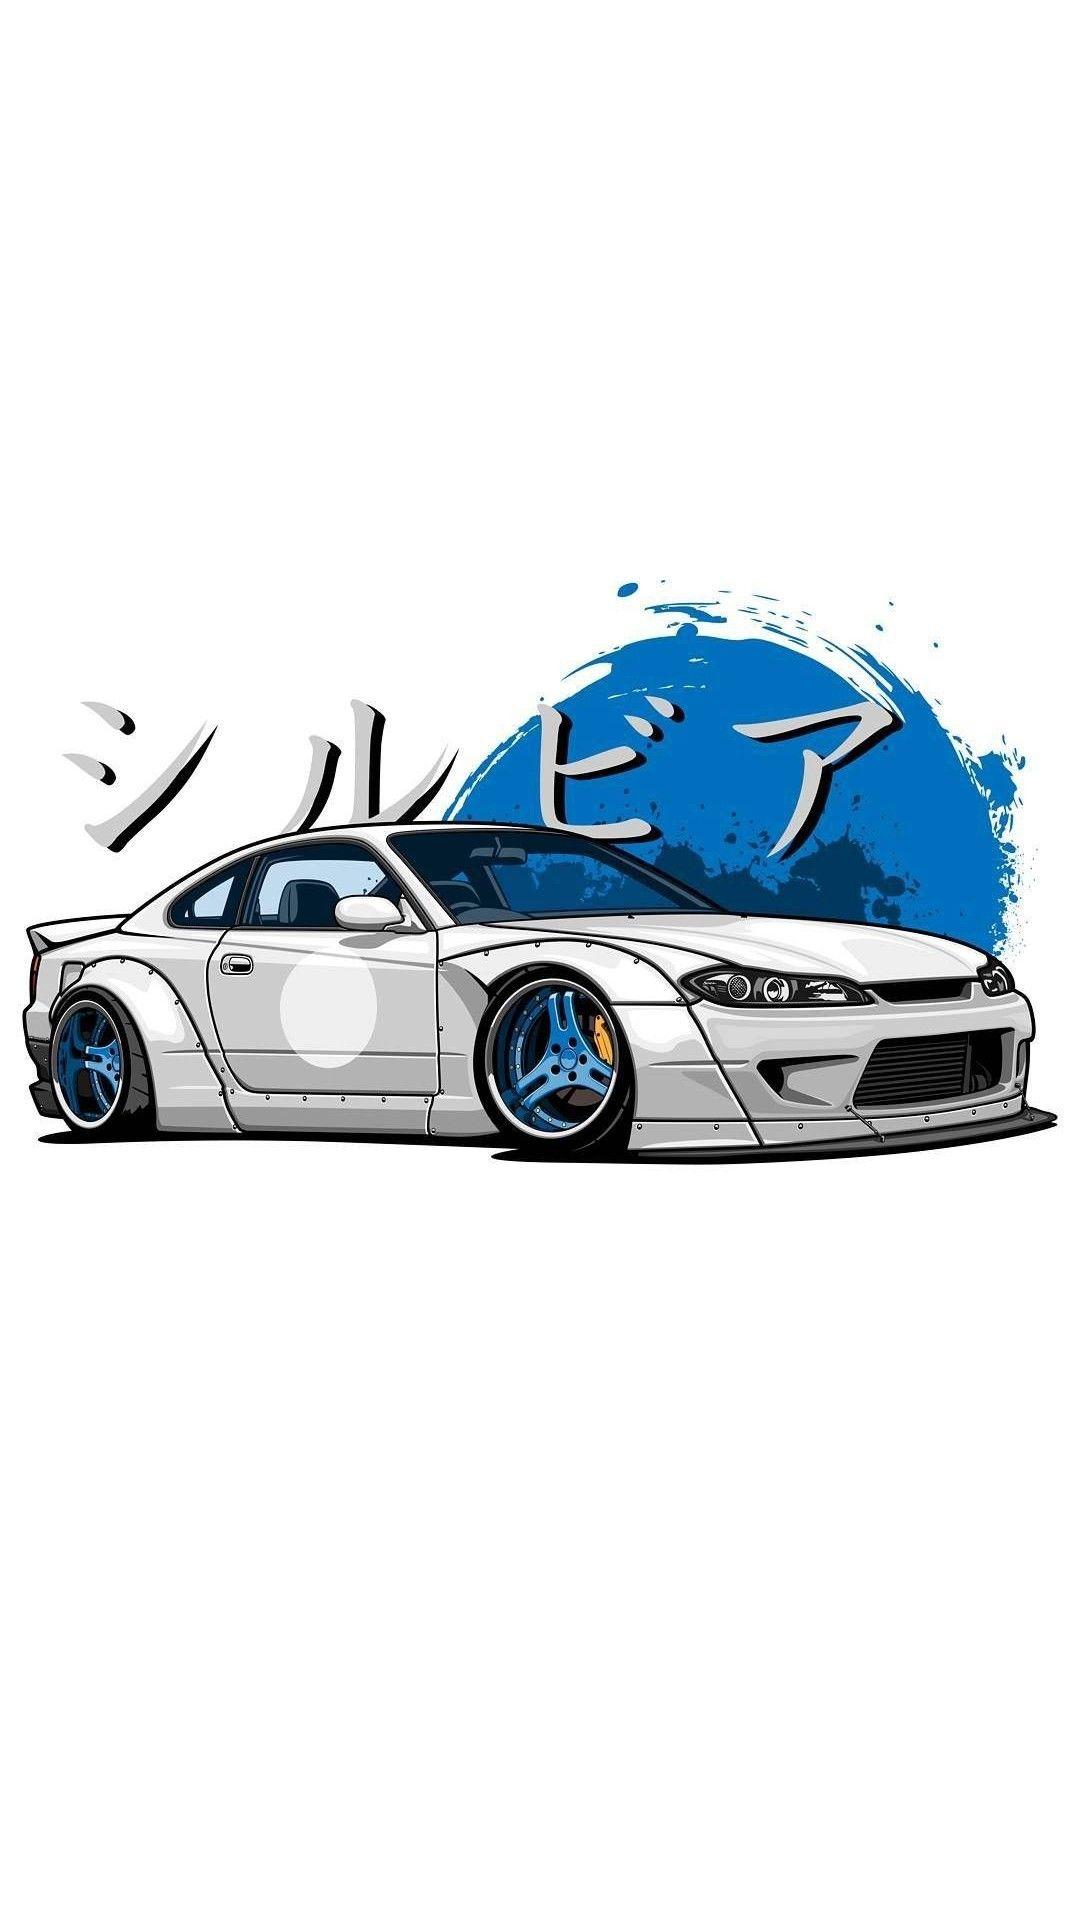 Pin By Joe Klopfenstein On Cars Custom Cars Art Cars Jdm Wallpaper